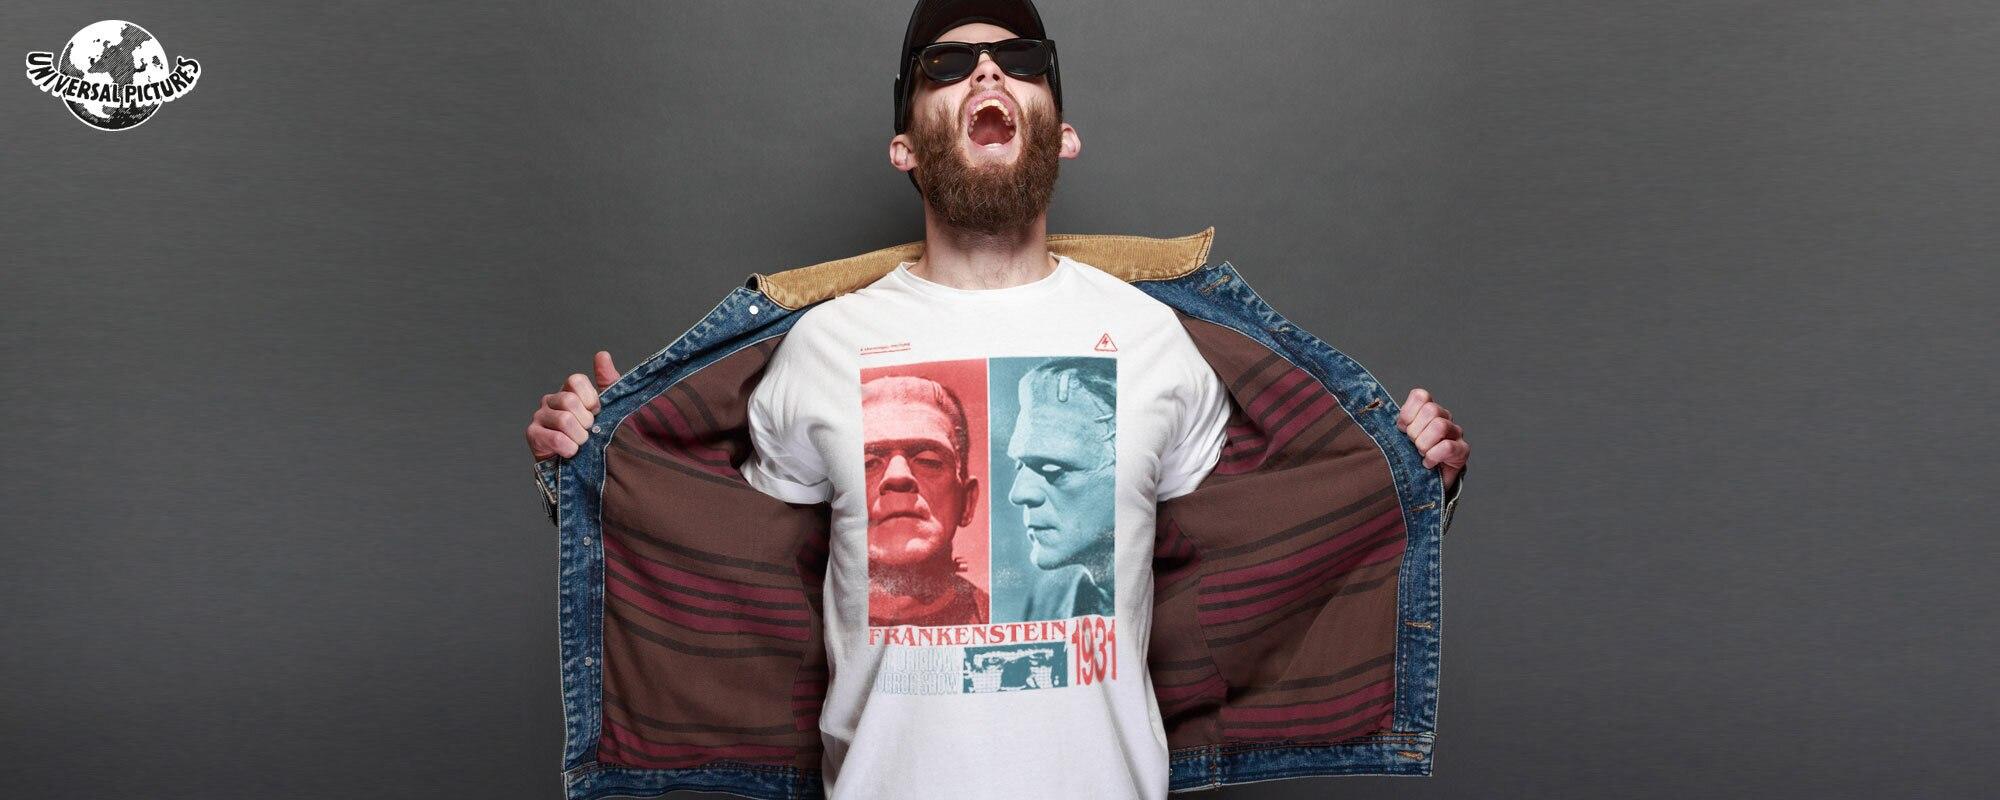 https://www.shirtstore.se/pub_docs/files/Startsida2021/2021-UniversalMonsters.jpg